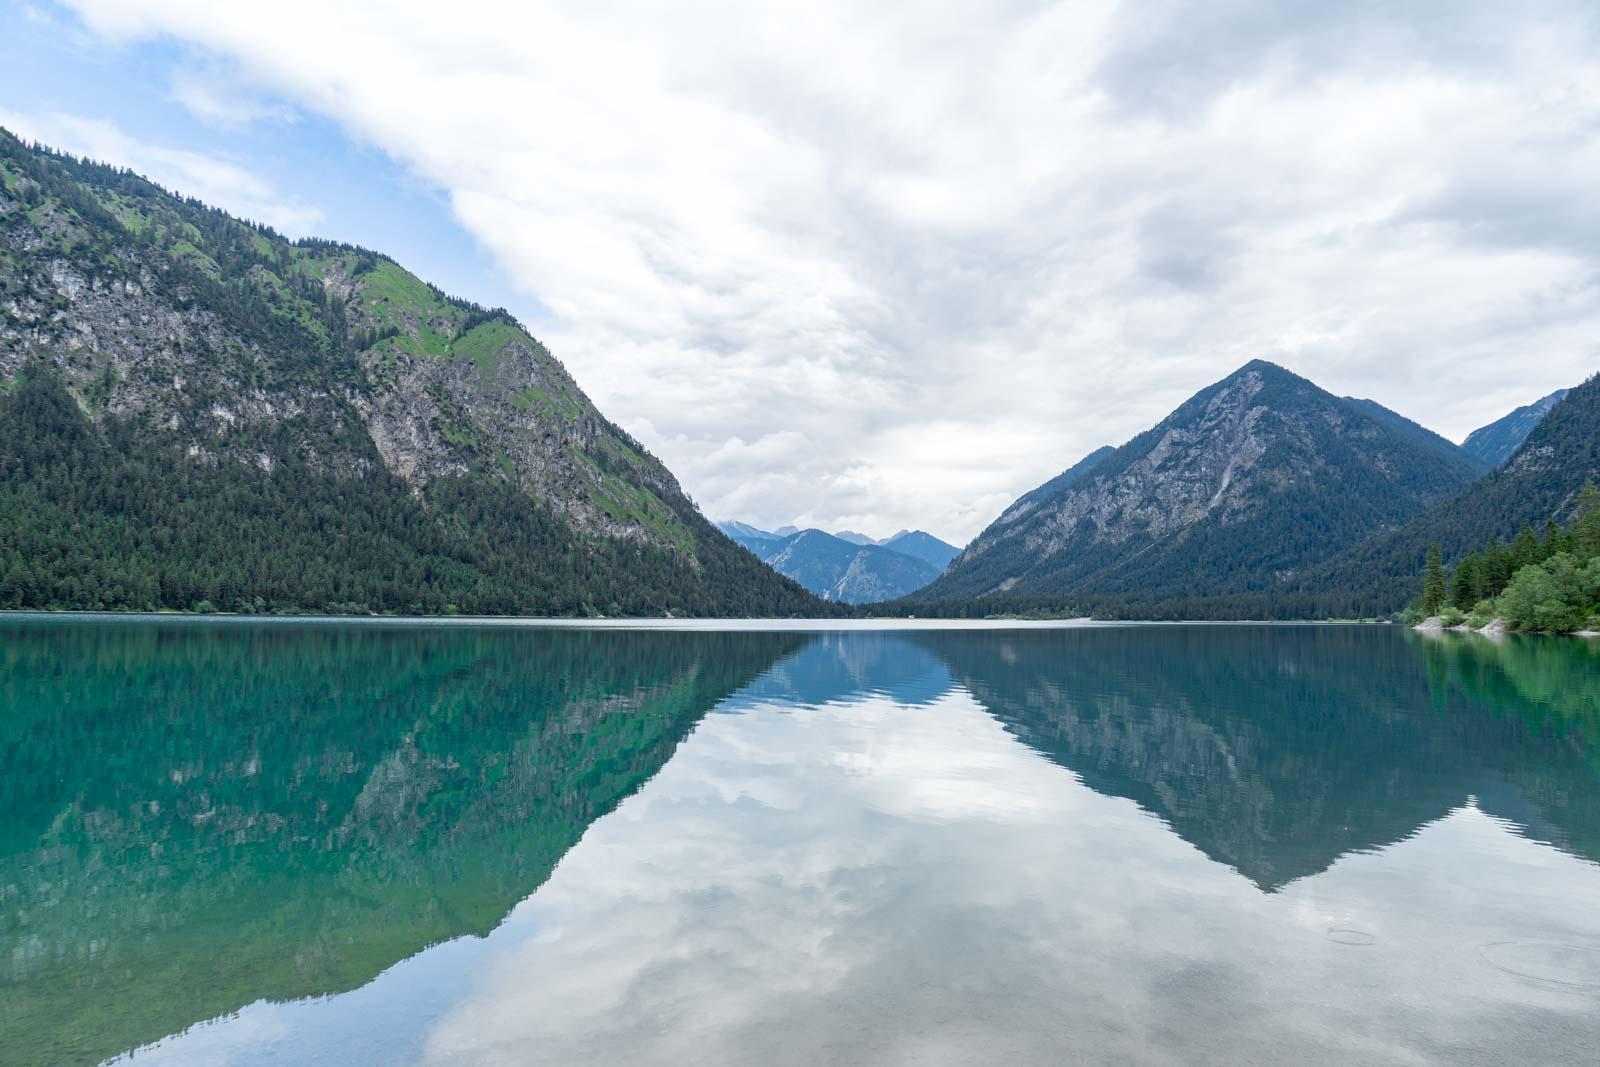 Heiterwangersee Lake, Tirol, Austria